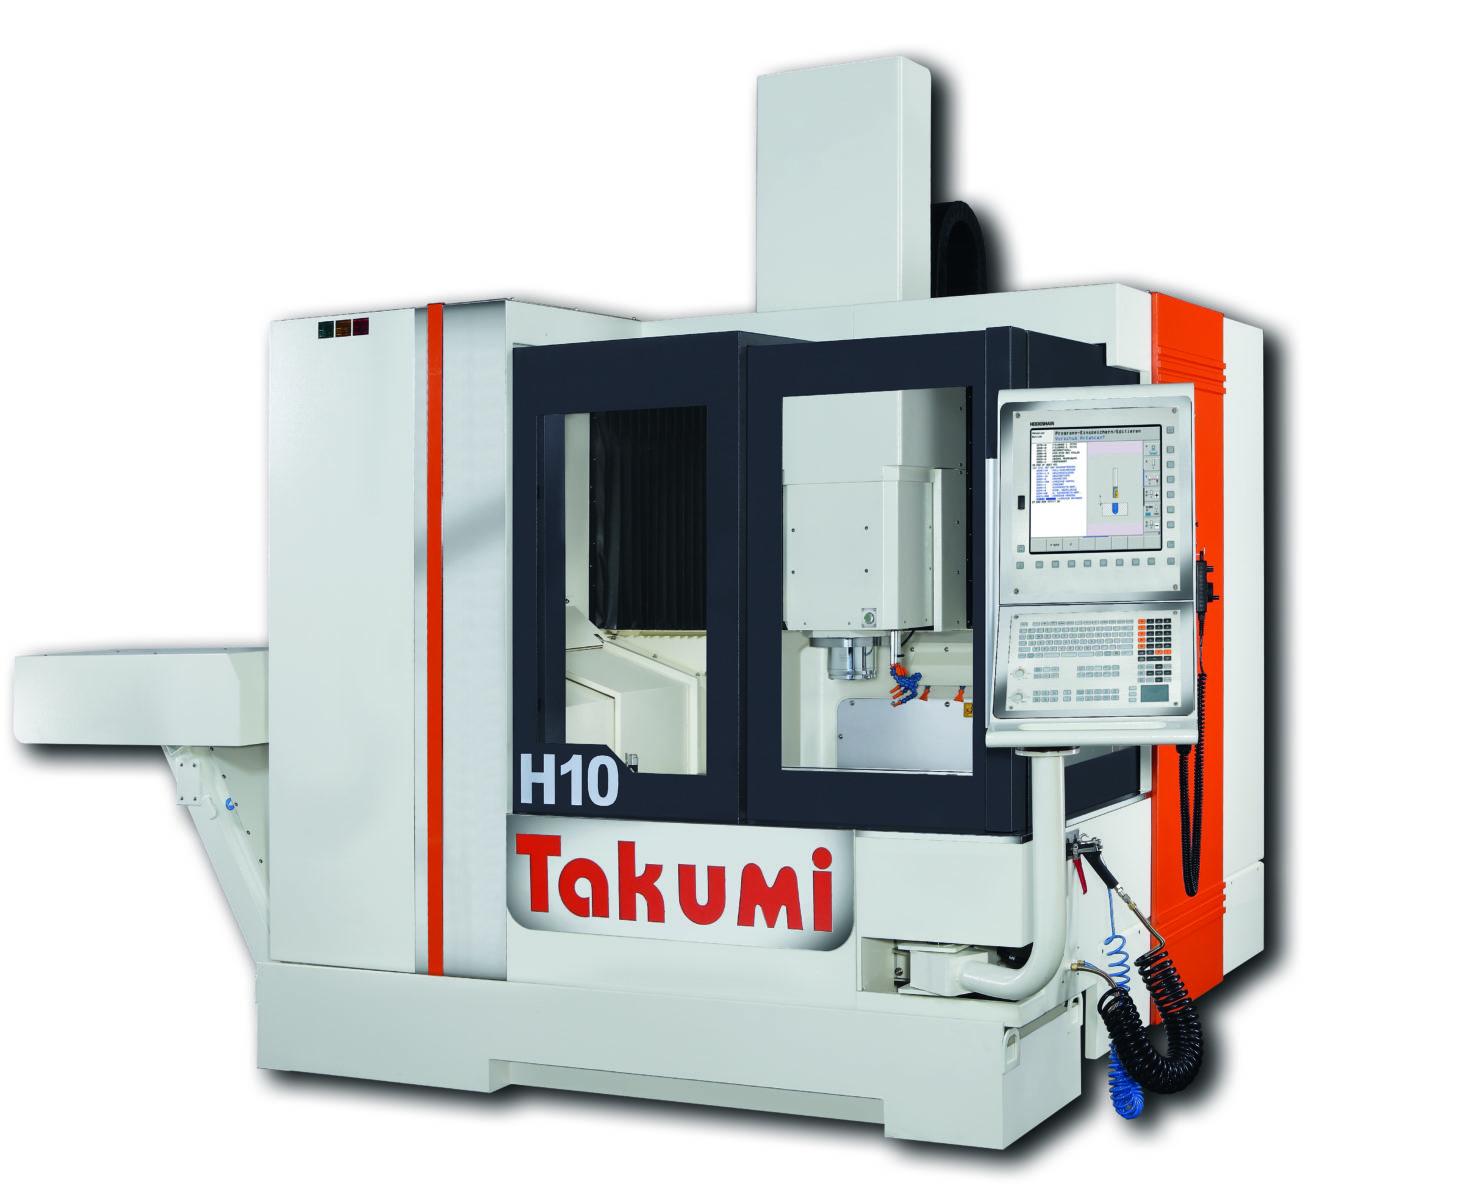 Takumi H10: 3-Achs-BAZ withHeidenhain Control for Die & Mold